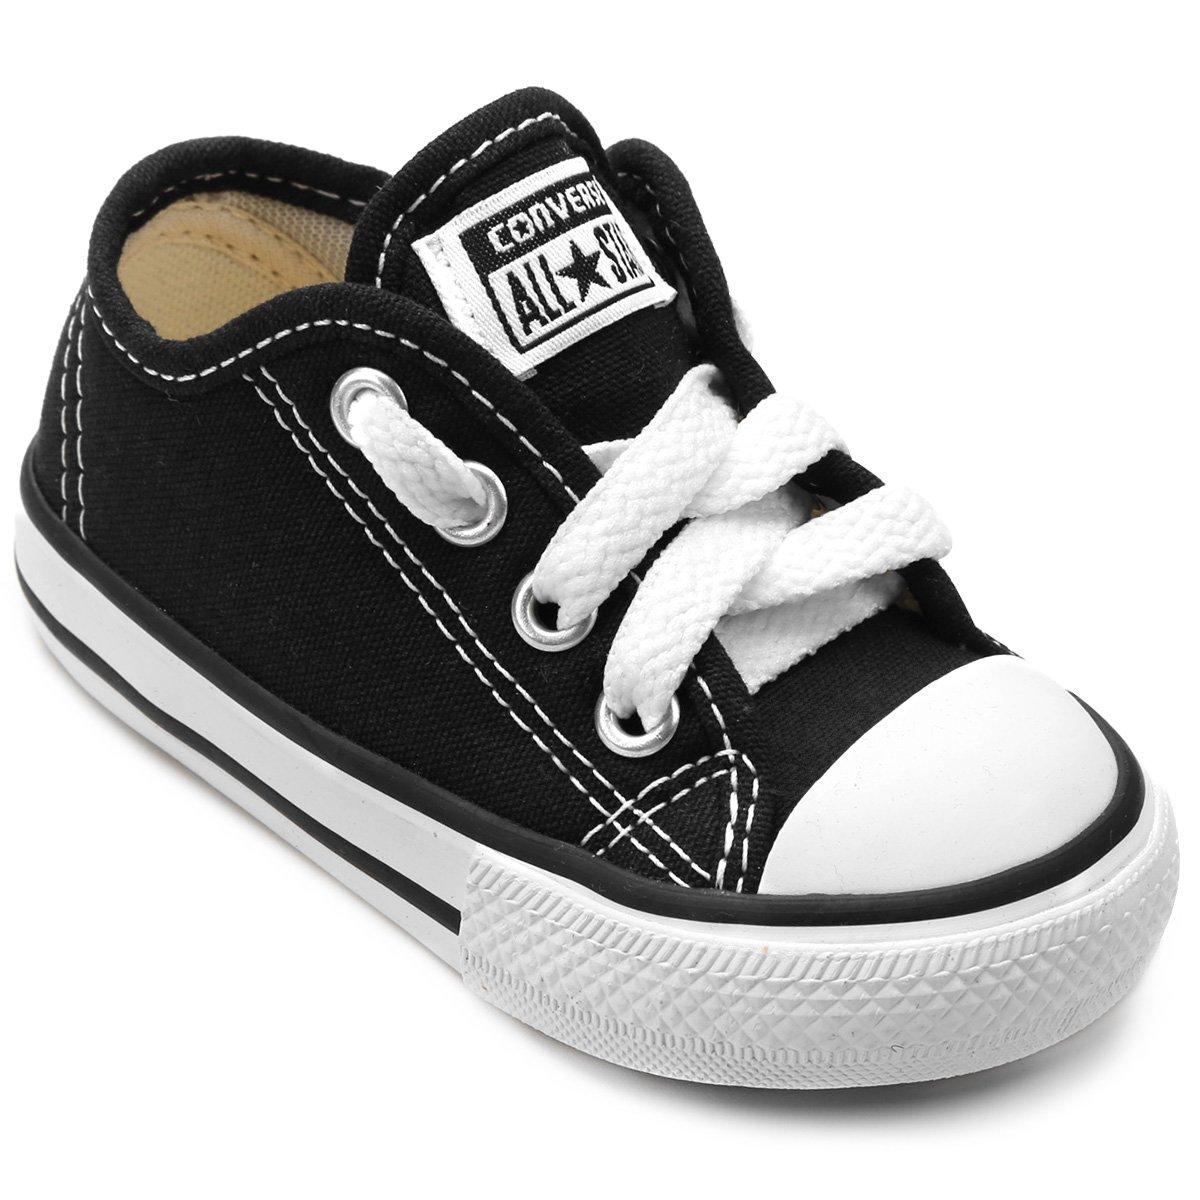 97507d4ad Tênis Infantil Converse All Star Chuck Taylor Border Baby - Preto - Compre  Agora